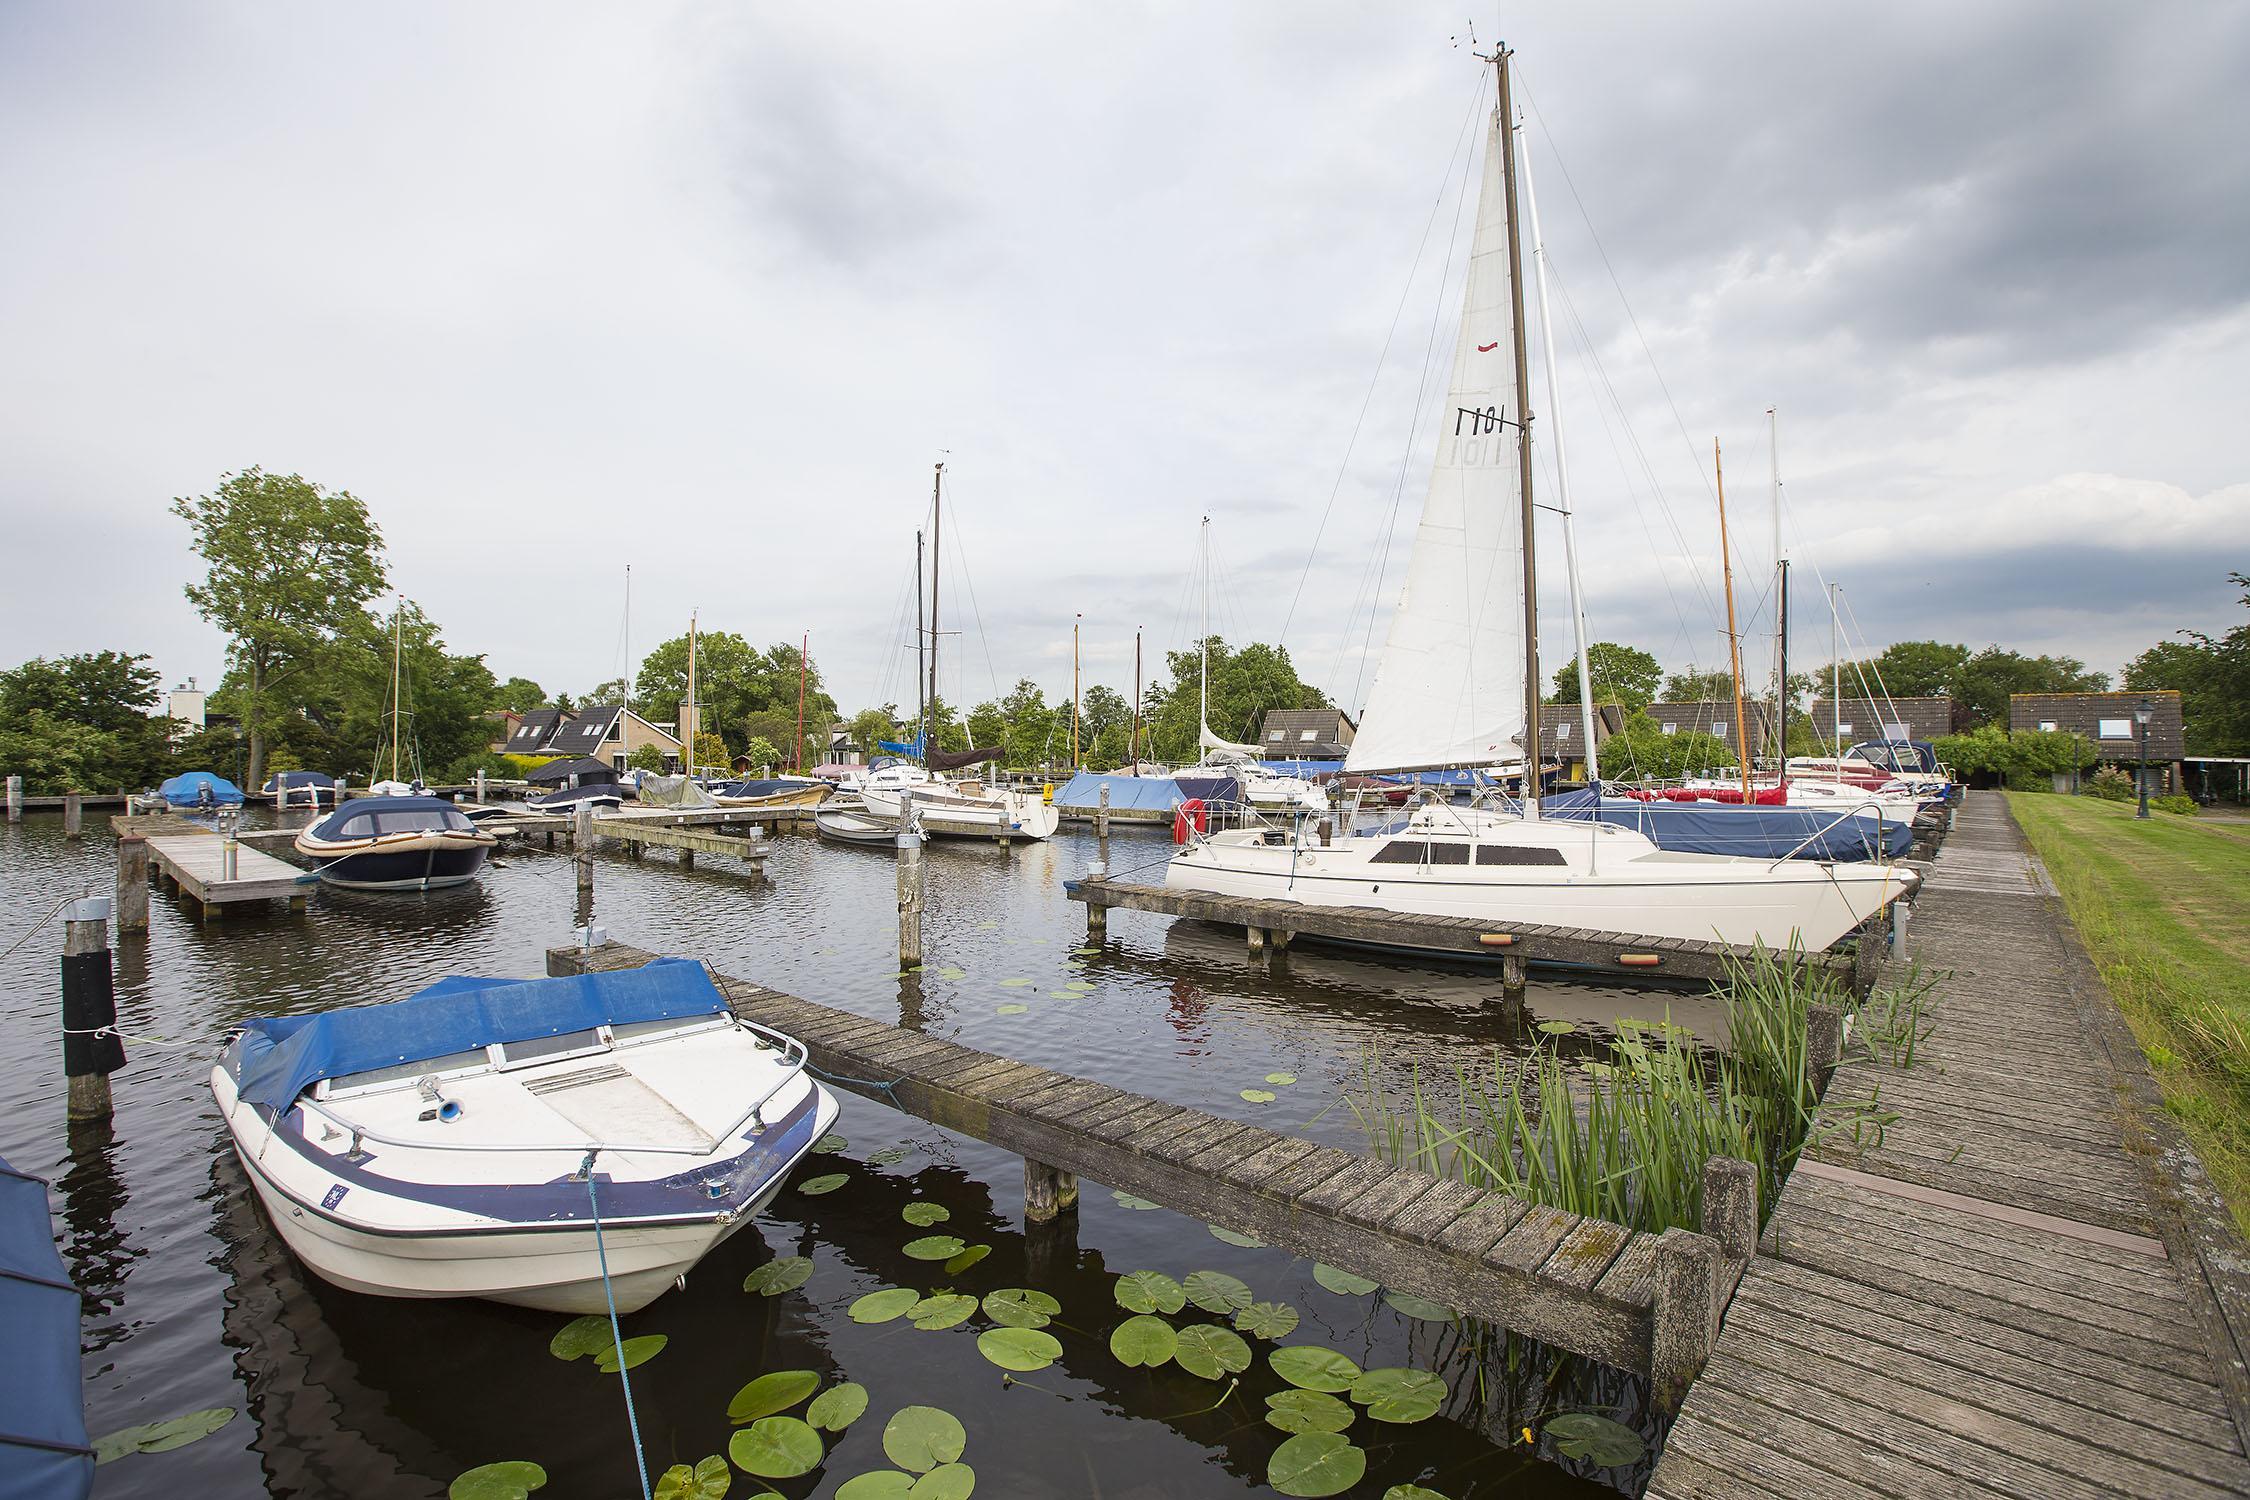 Teylingen mag 'latere' permanente bewoners Watertuin wegsturen